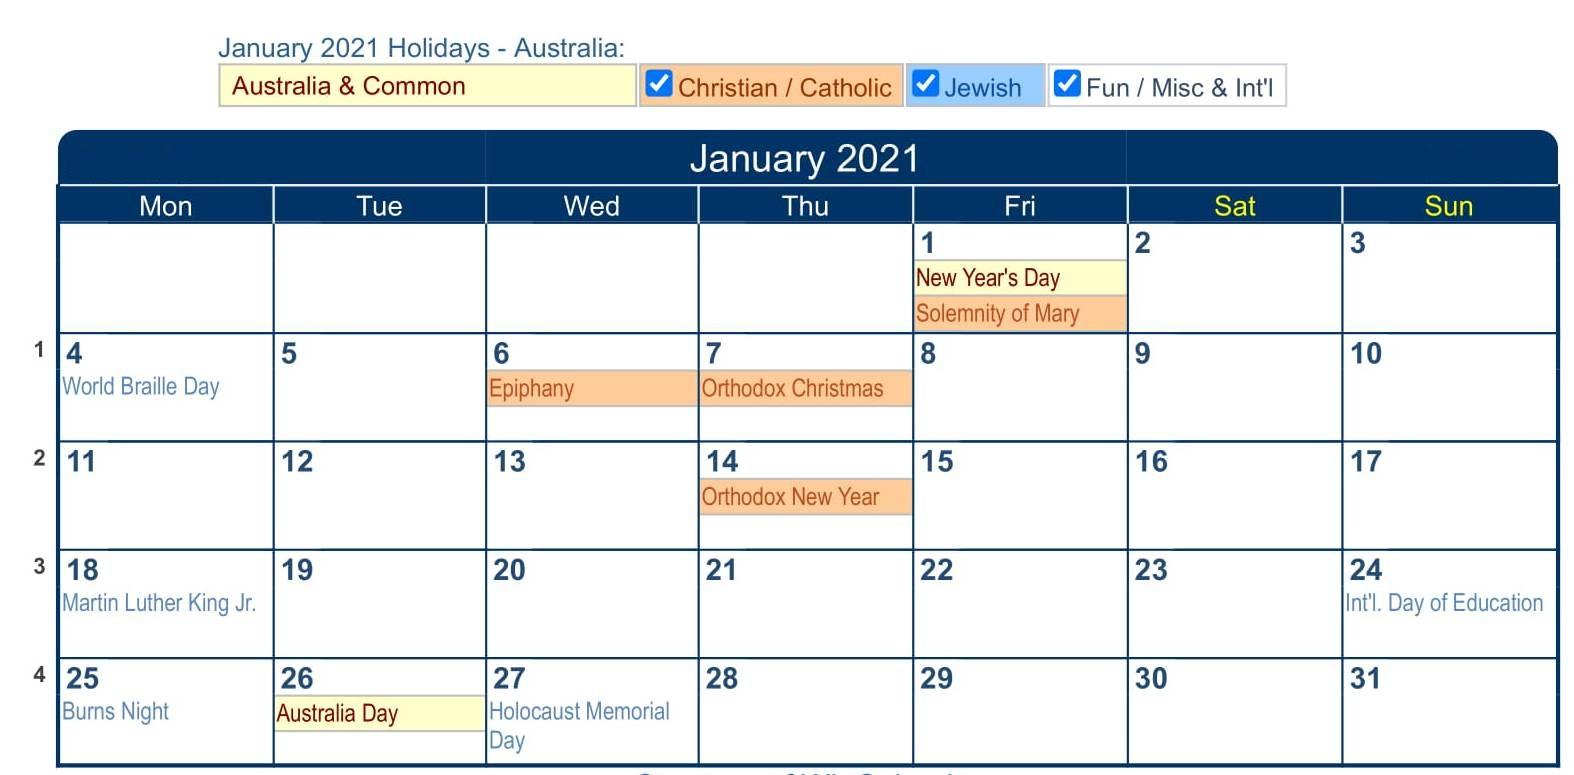 Free January 2021 Calendar Australia Template With Holidays